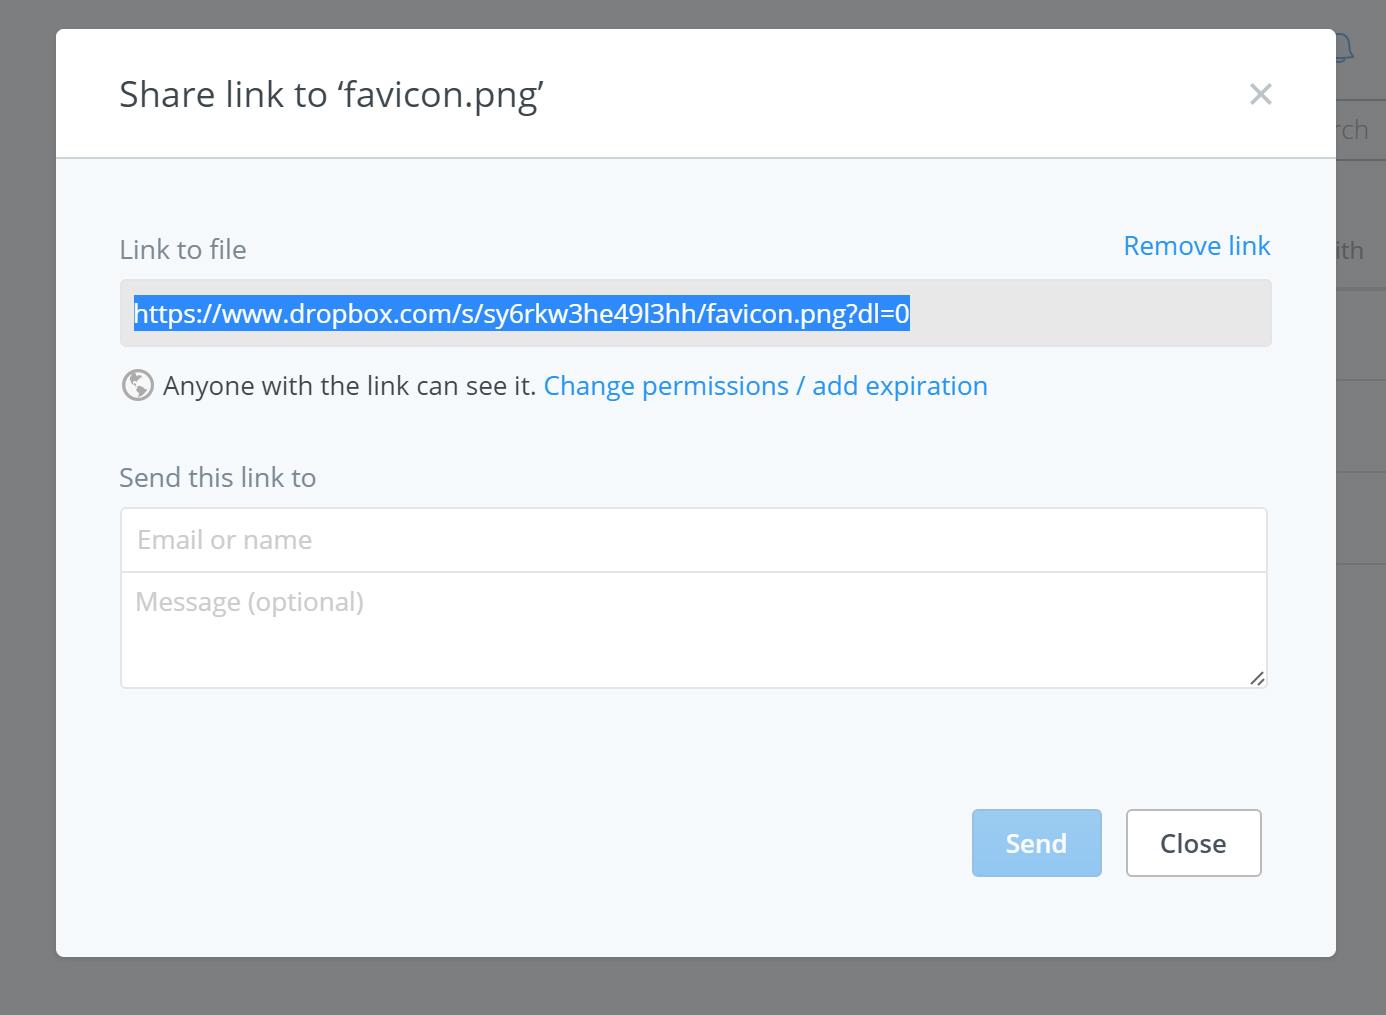 Shareable Link